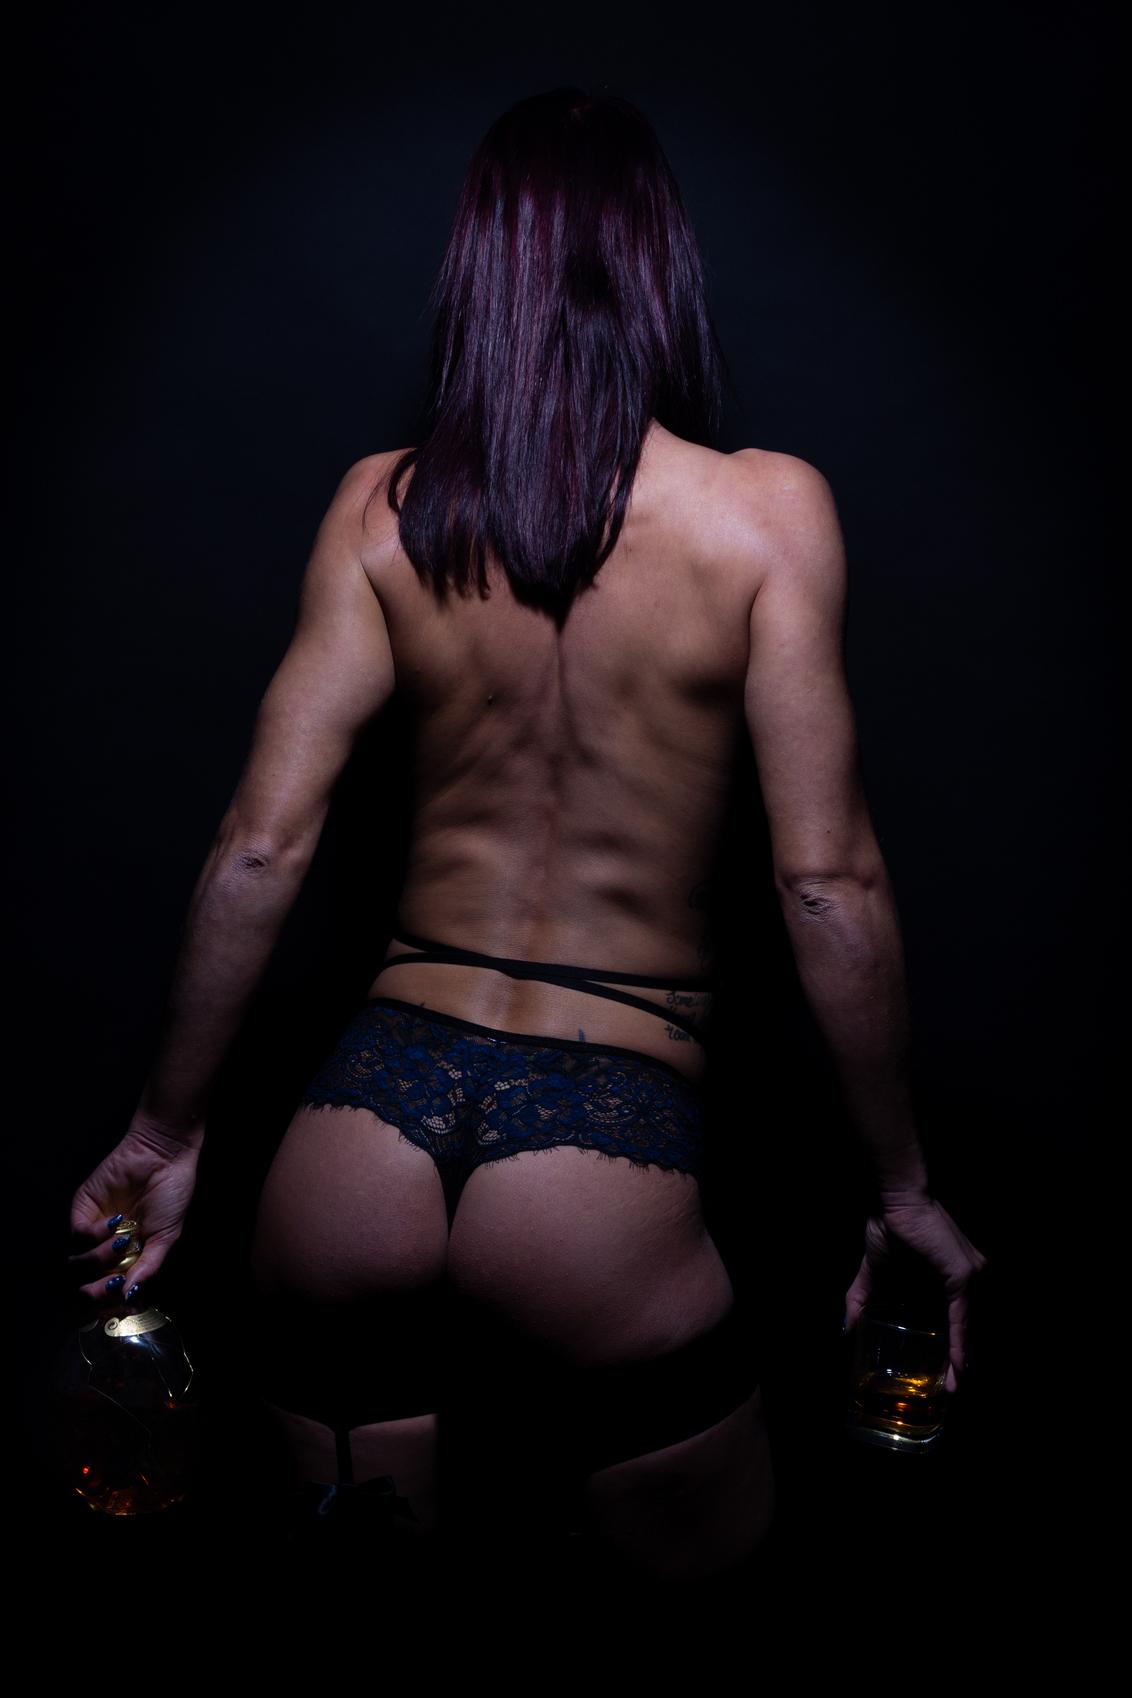 whiskey and wives - whiskey and wives - foto door frmike op 12-02-2019 - deze foto bevat: vrouw, portret, model, erotiek, naakt, pose, lingerie, studio, photoshop, fotoshoot